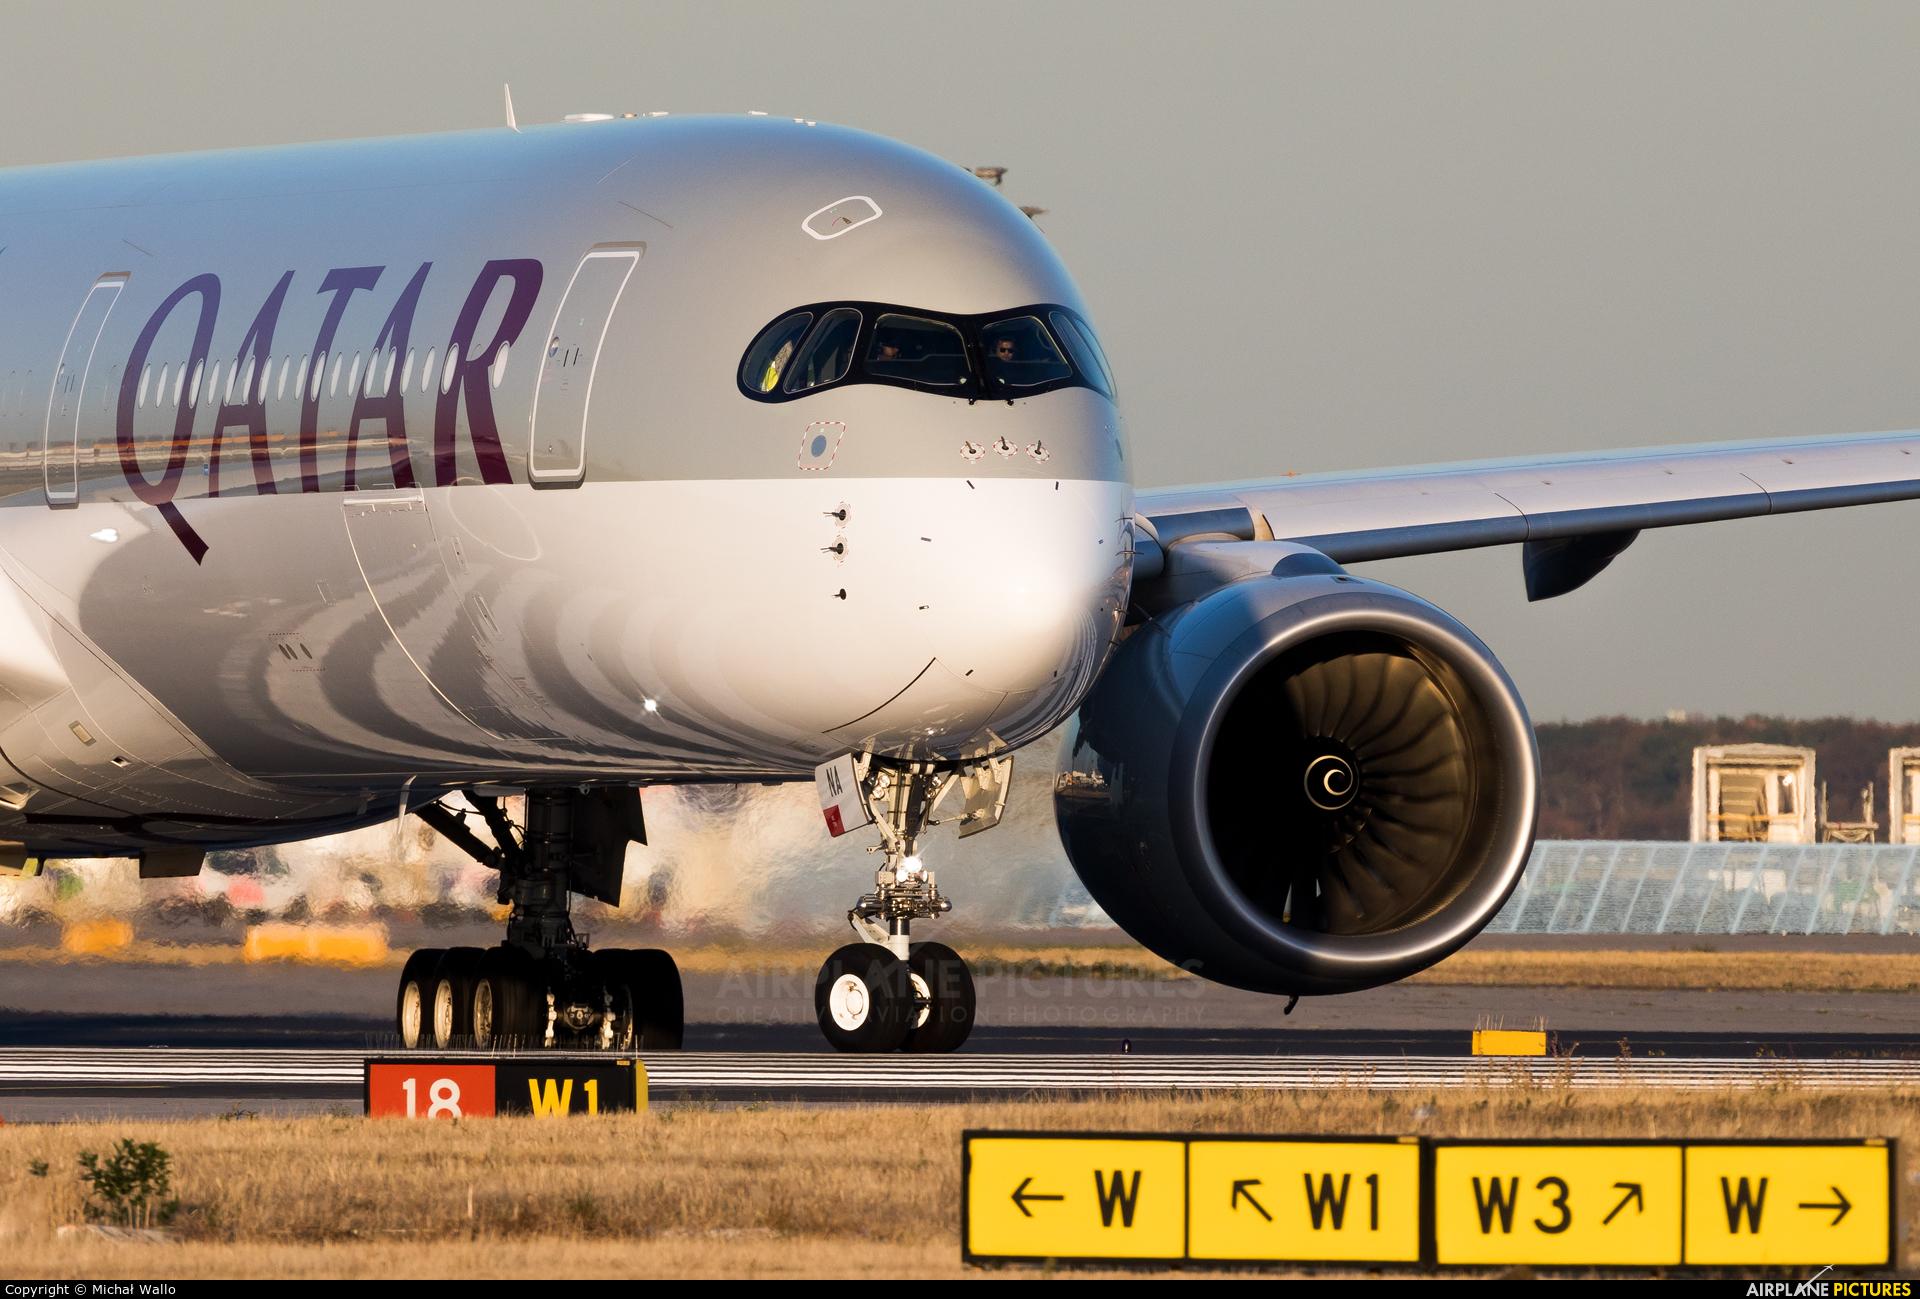 Qatar Airways A7-ANA aircraft at Frankfurt